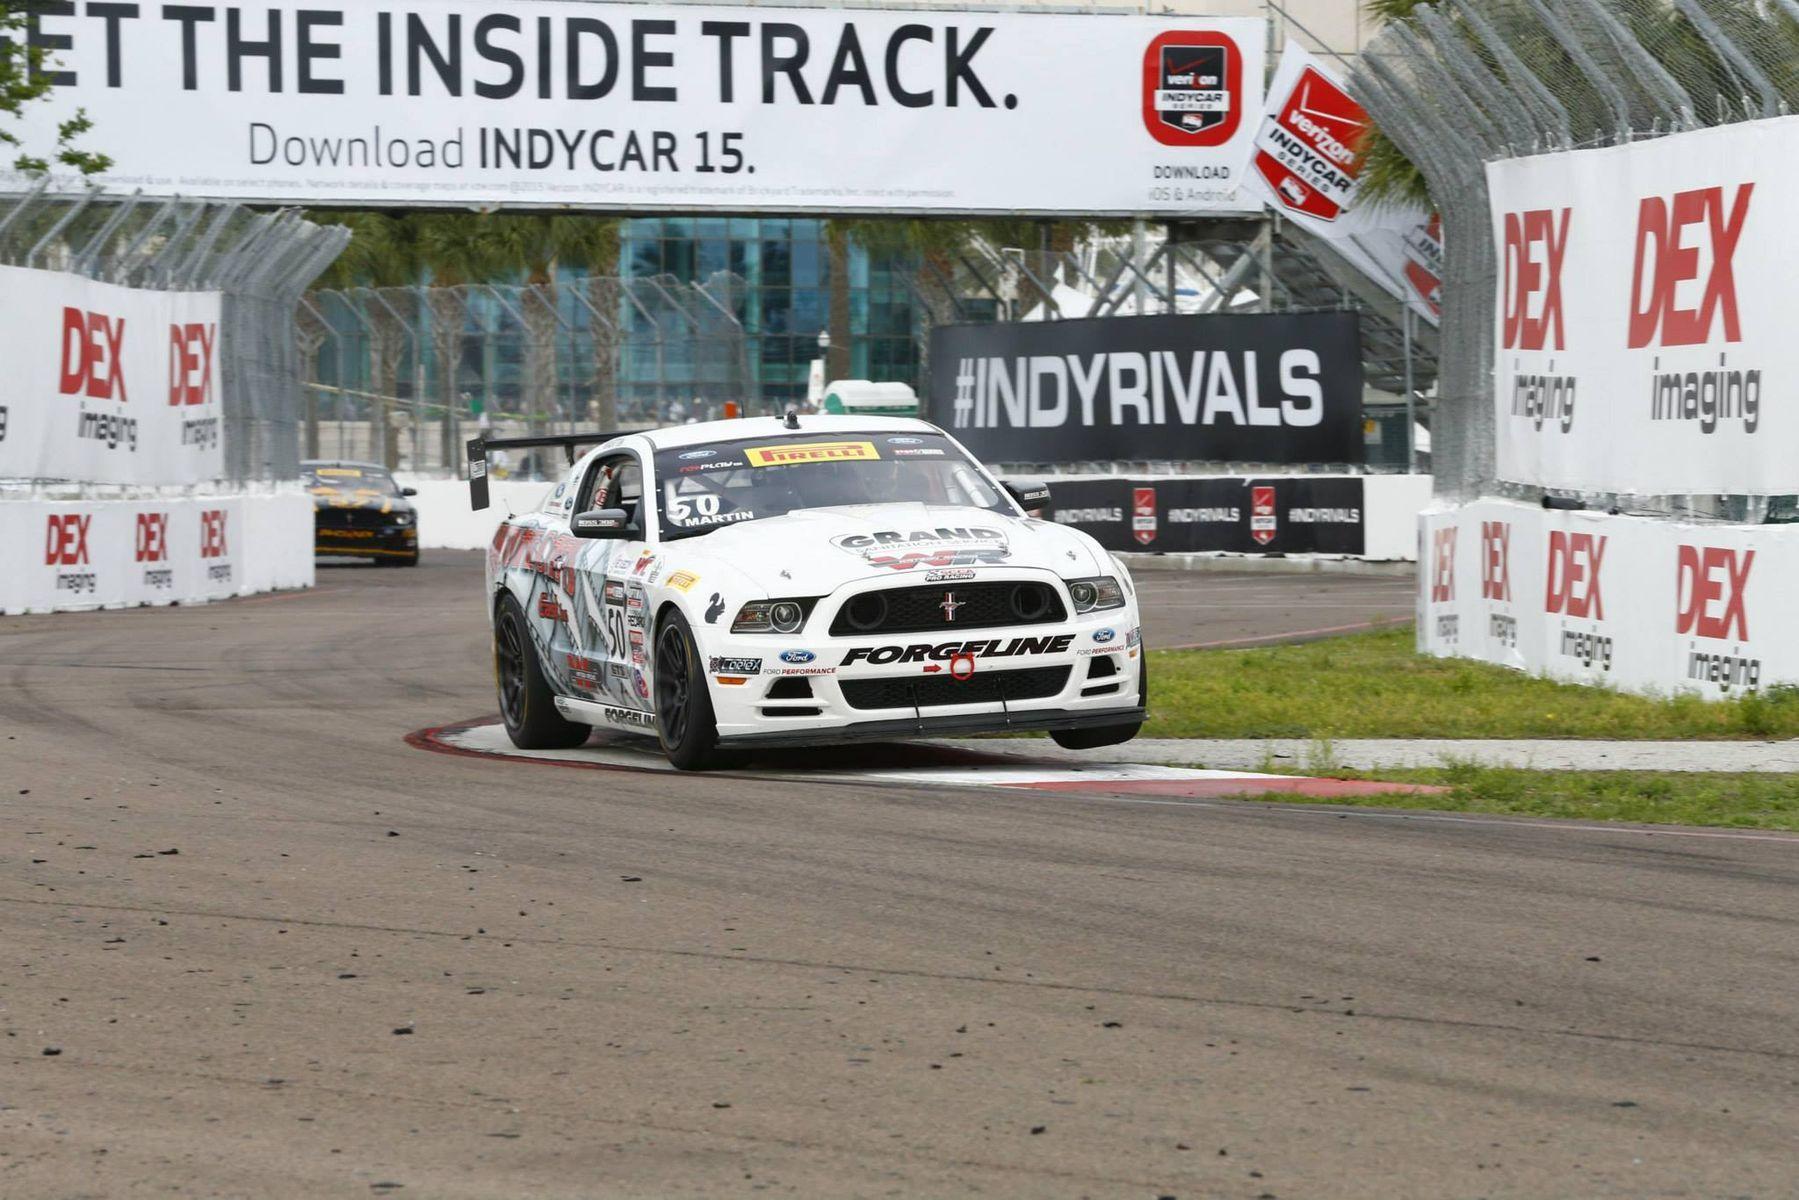 Ford Mustang |  Rehagen Racing at St. Petersburg 2015